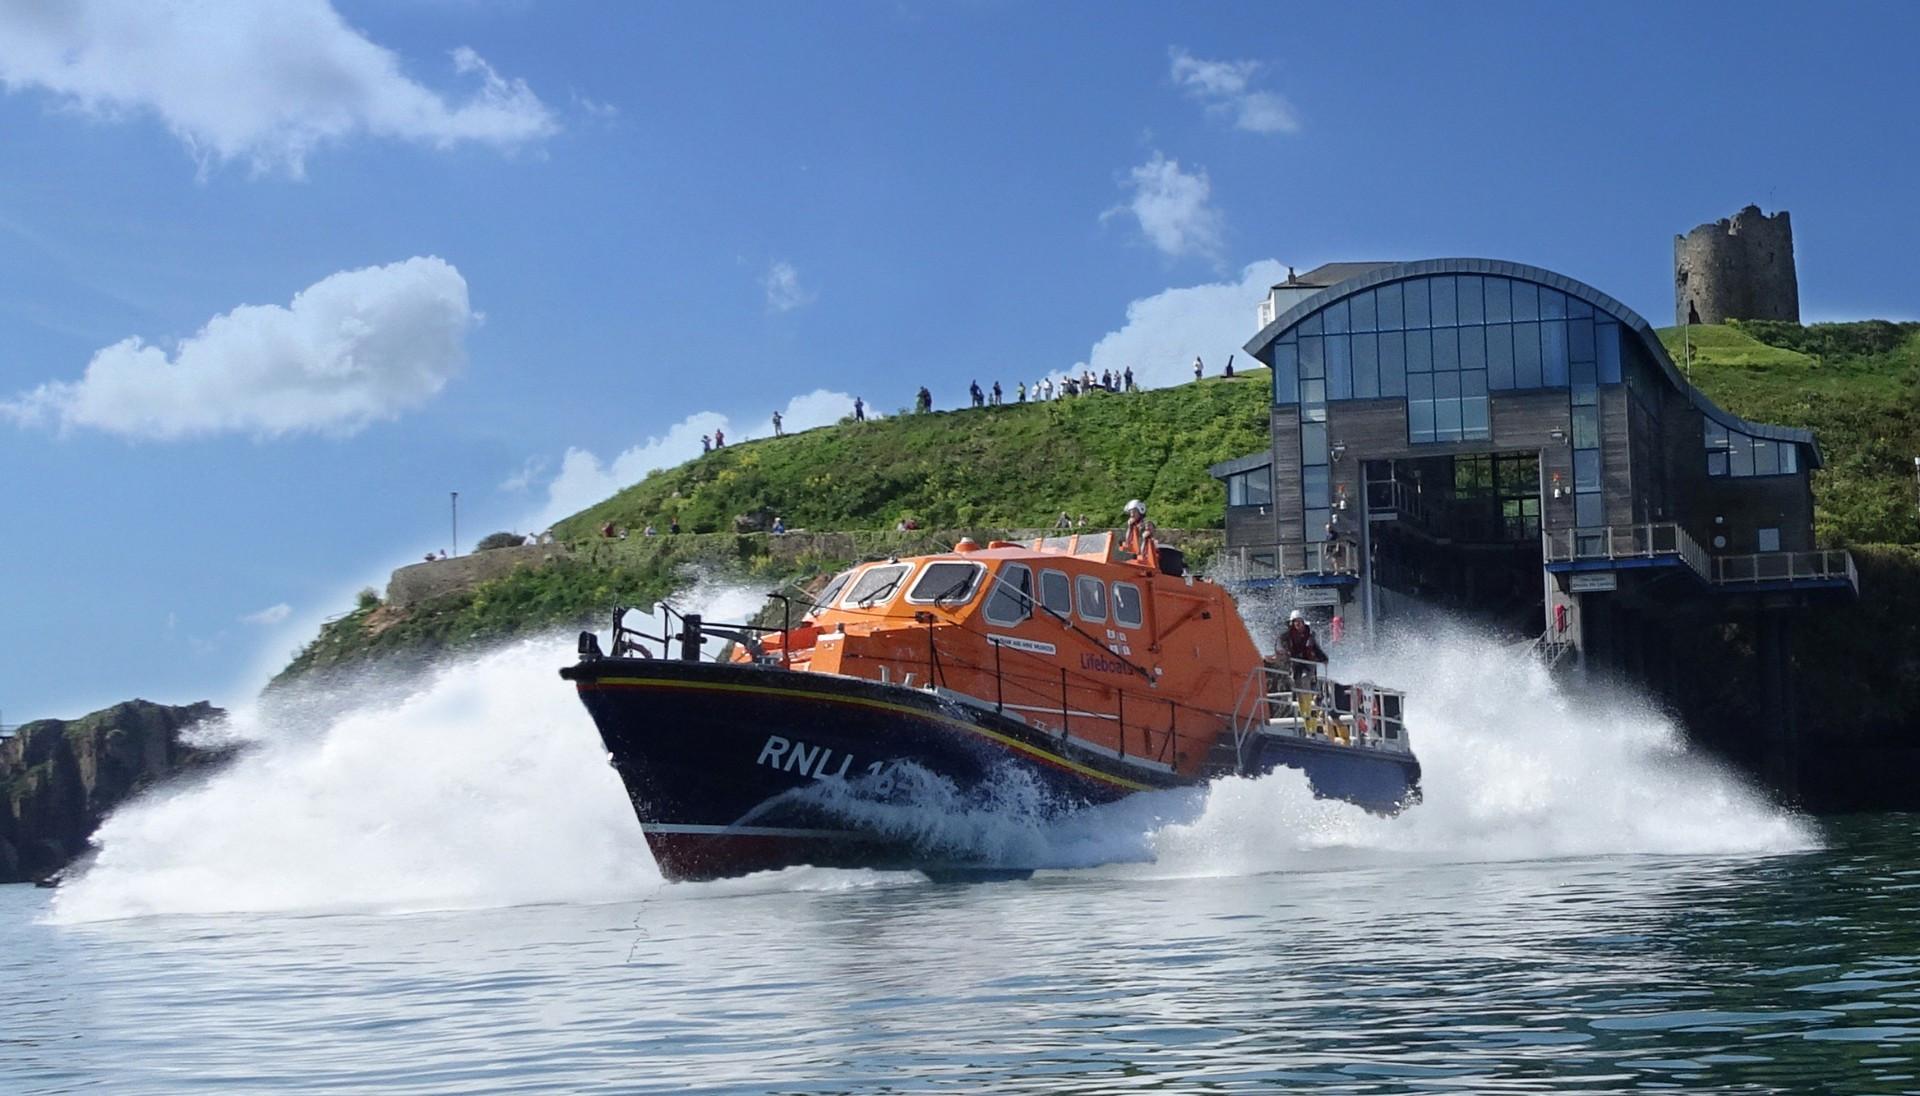 Tenby Lifeboat